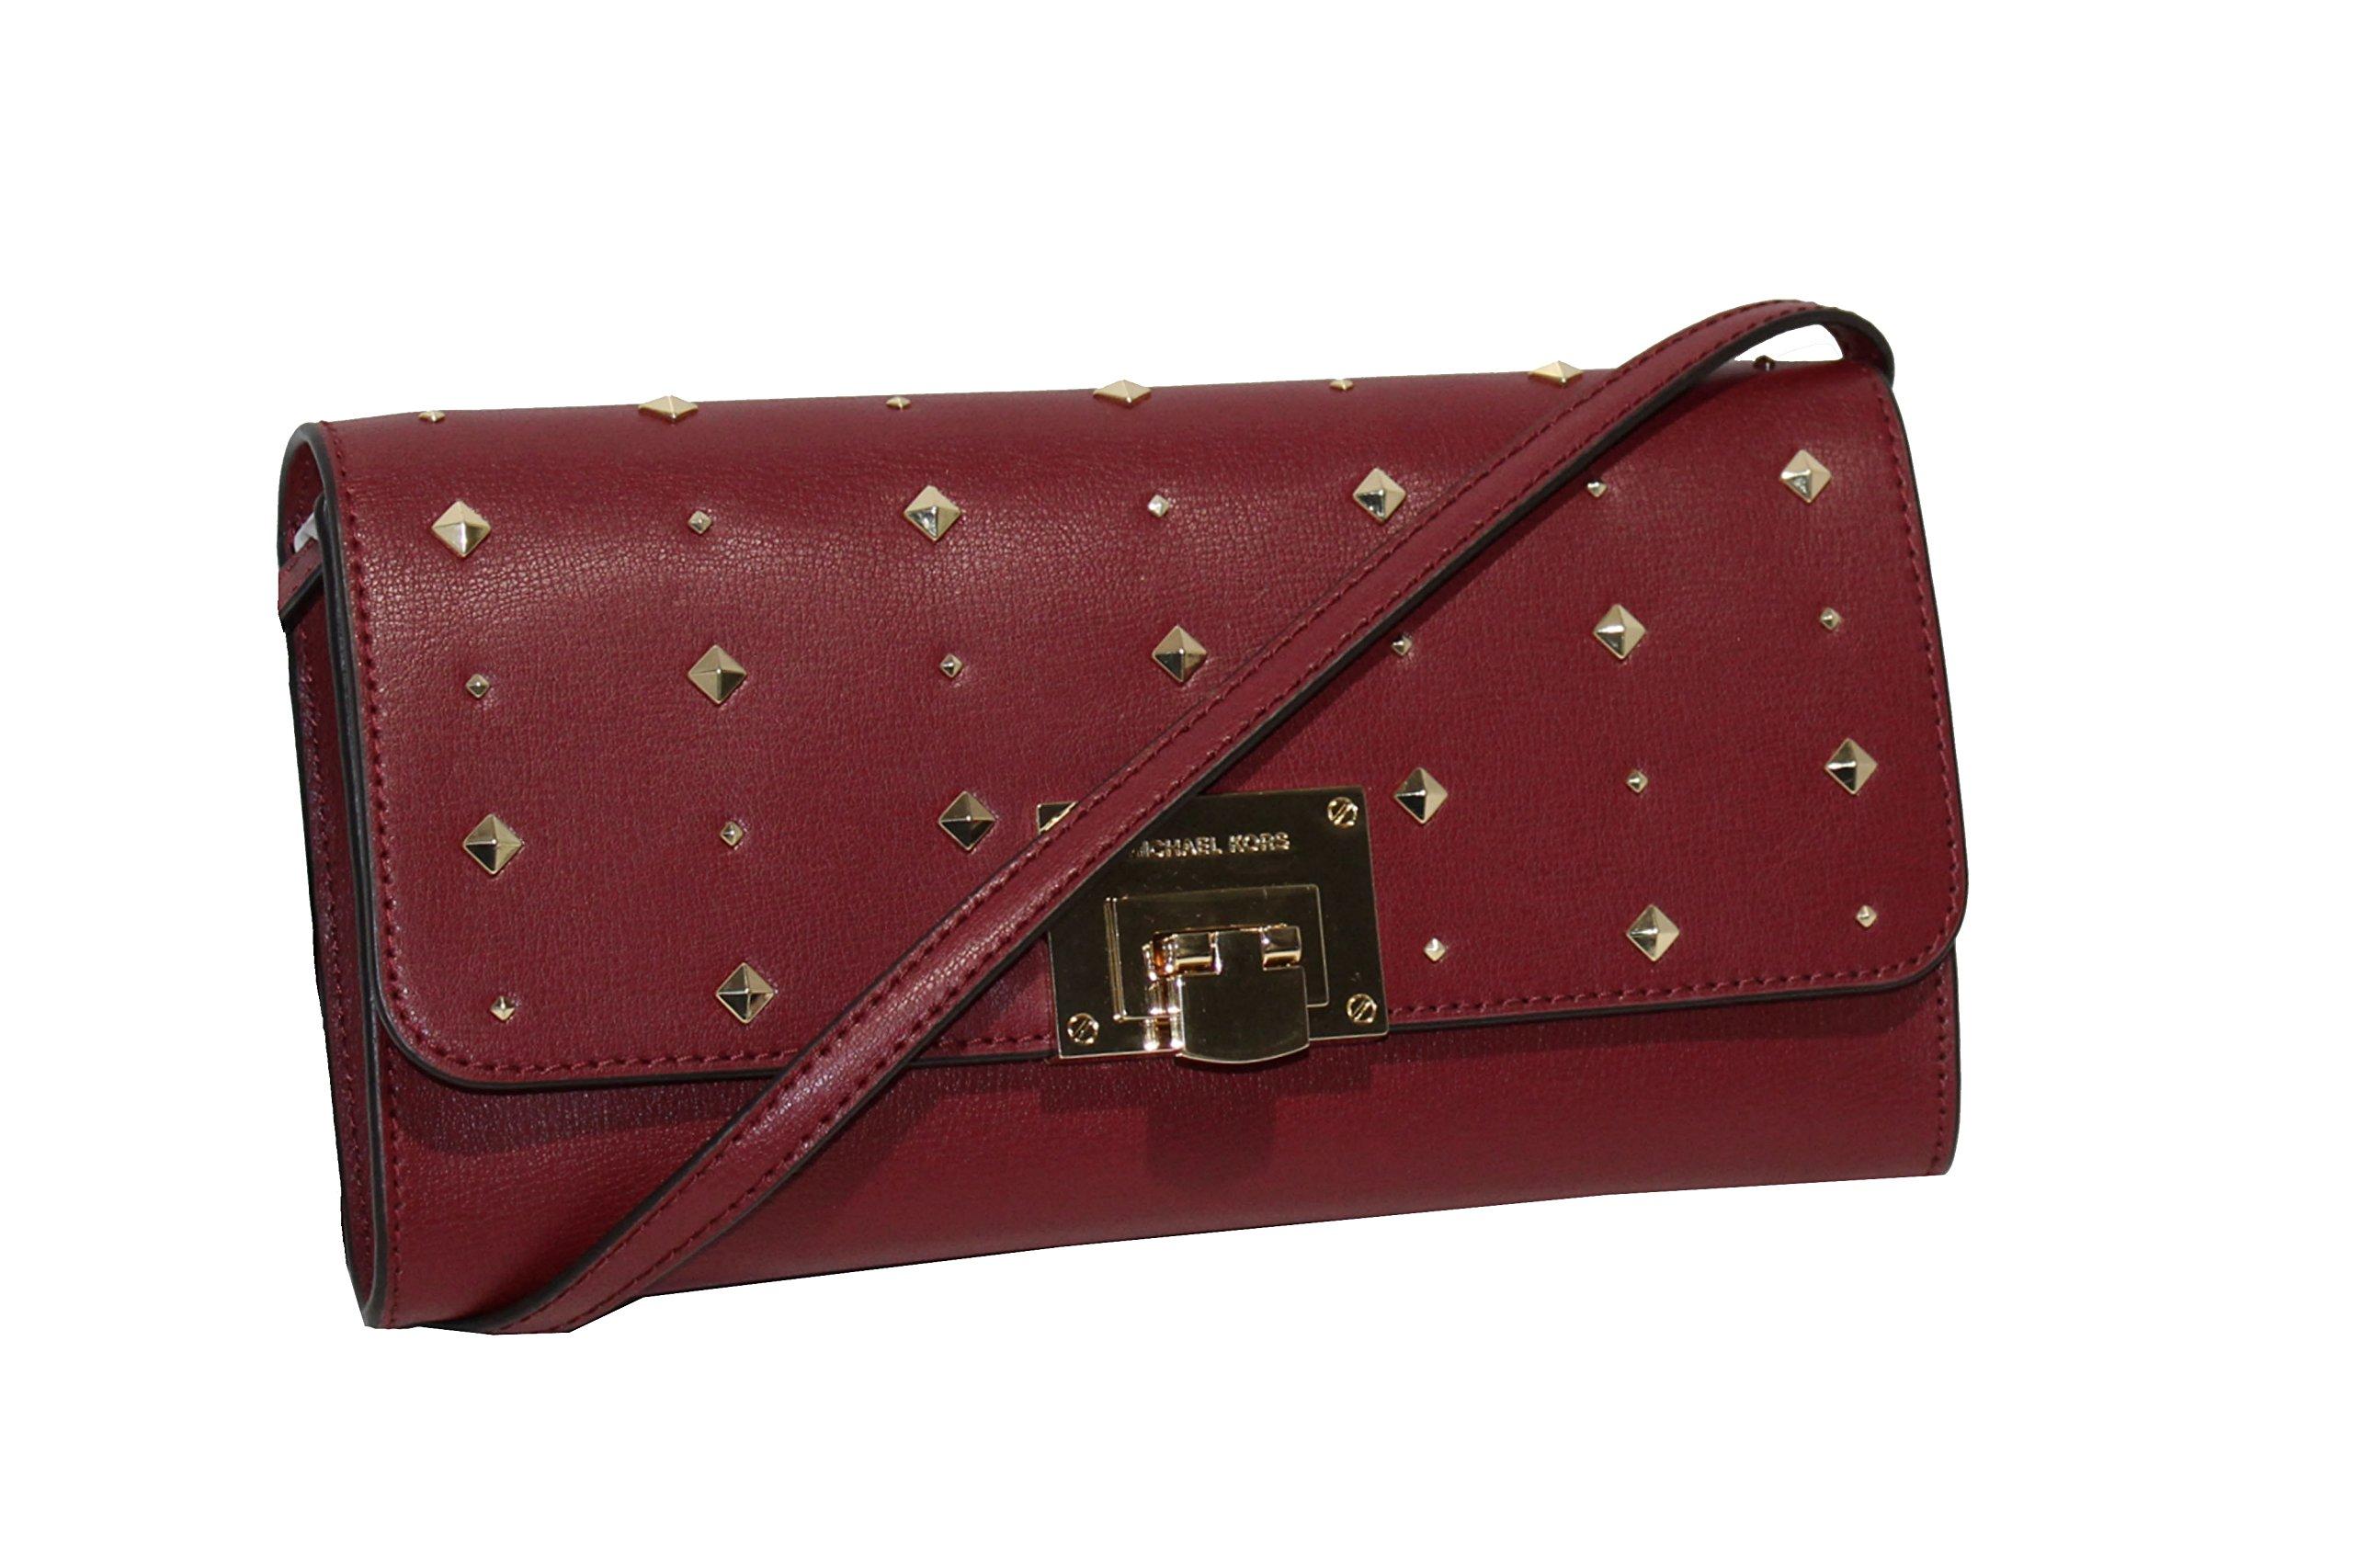 MICHAEL Michael Kors Women's TINA Leather Shoulder Handbag CLUTCH (CHERRY) by MICHAEL Michael Kors